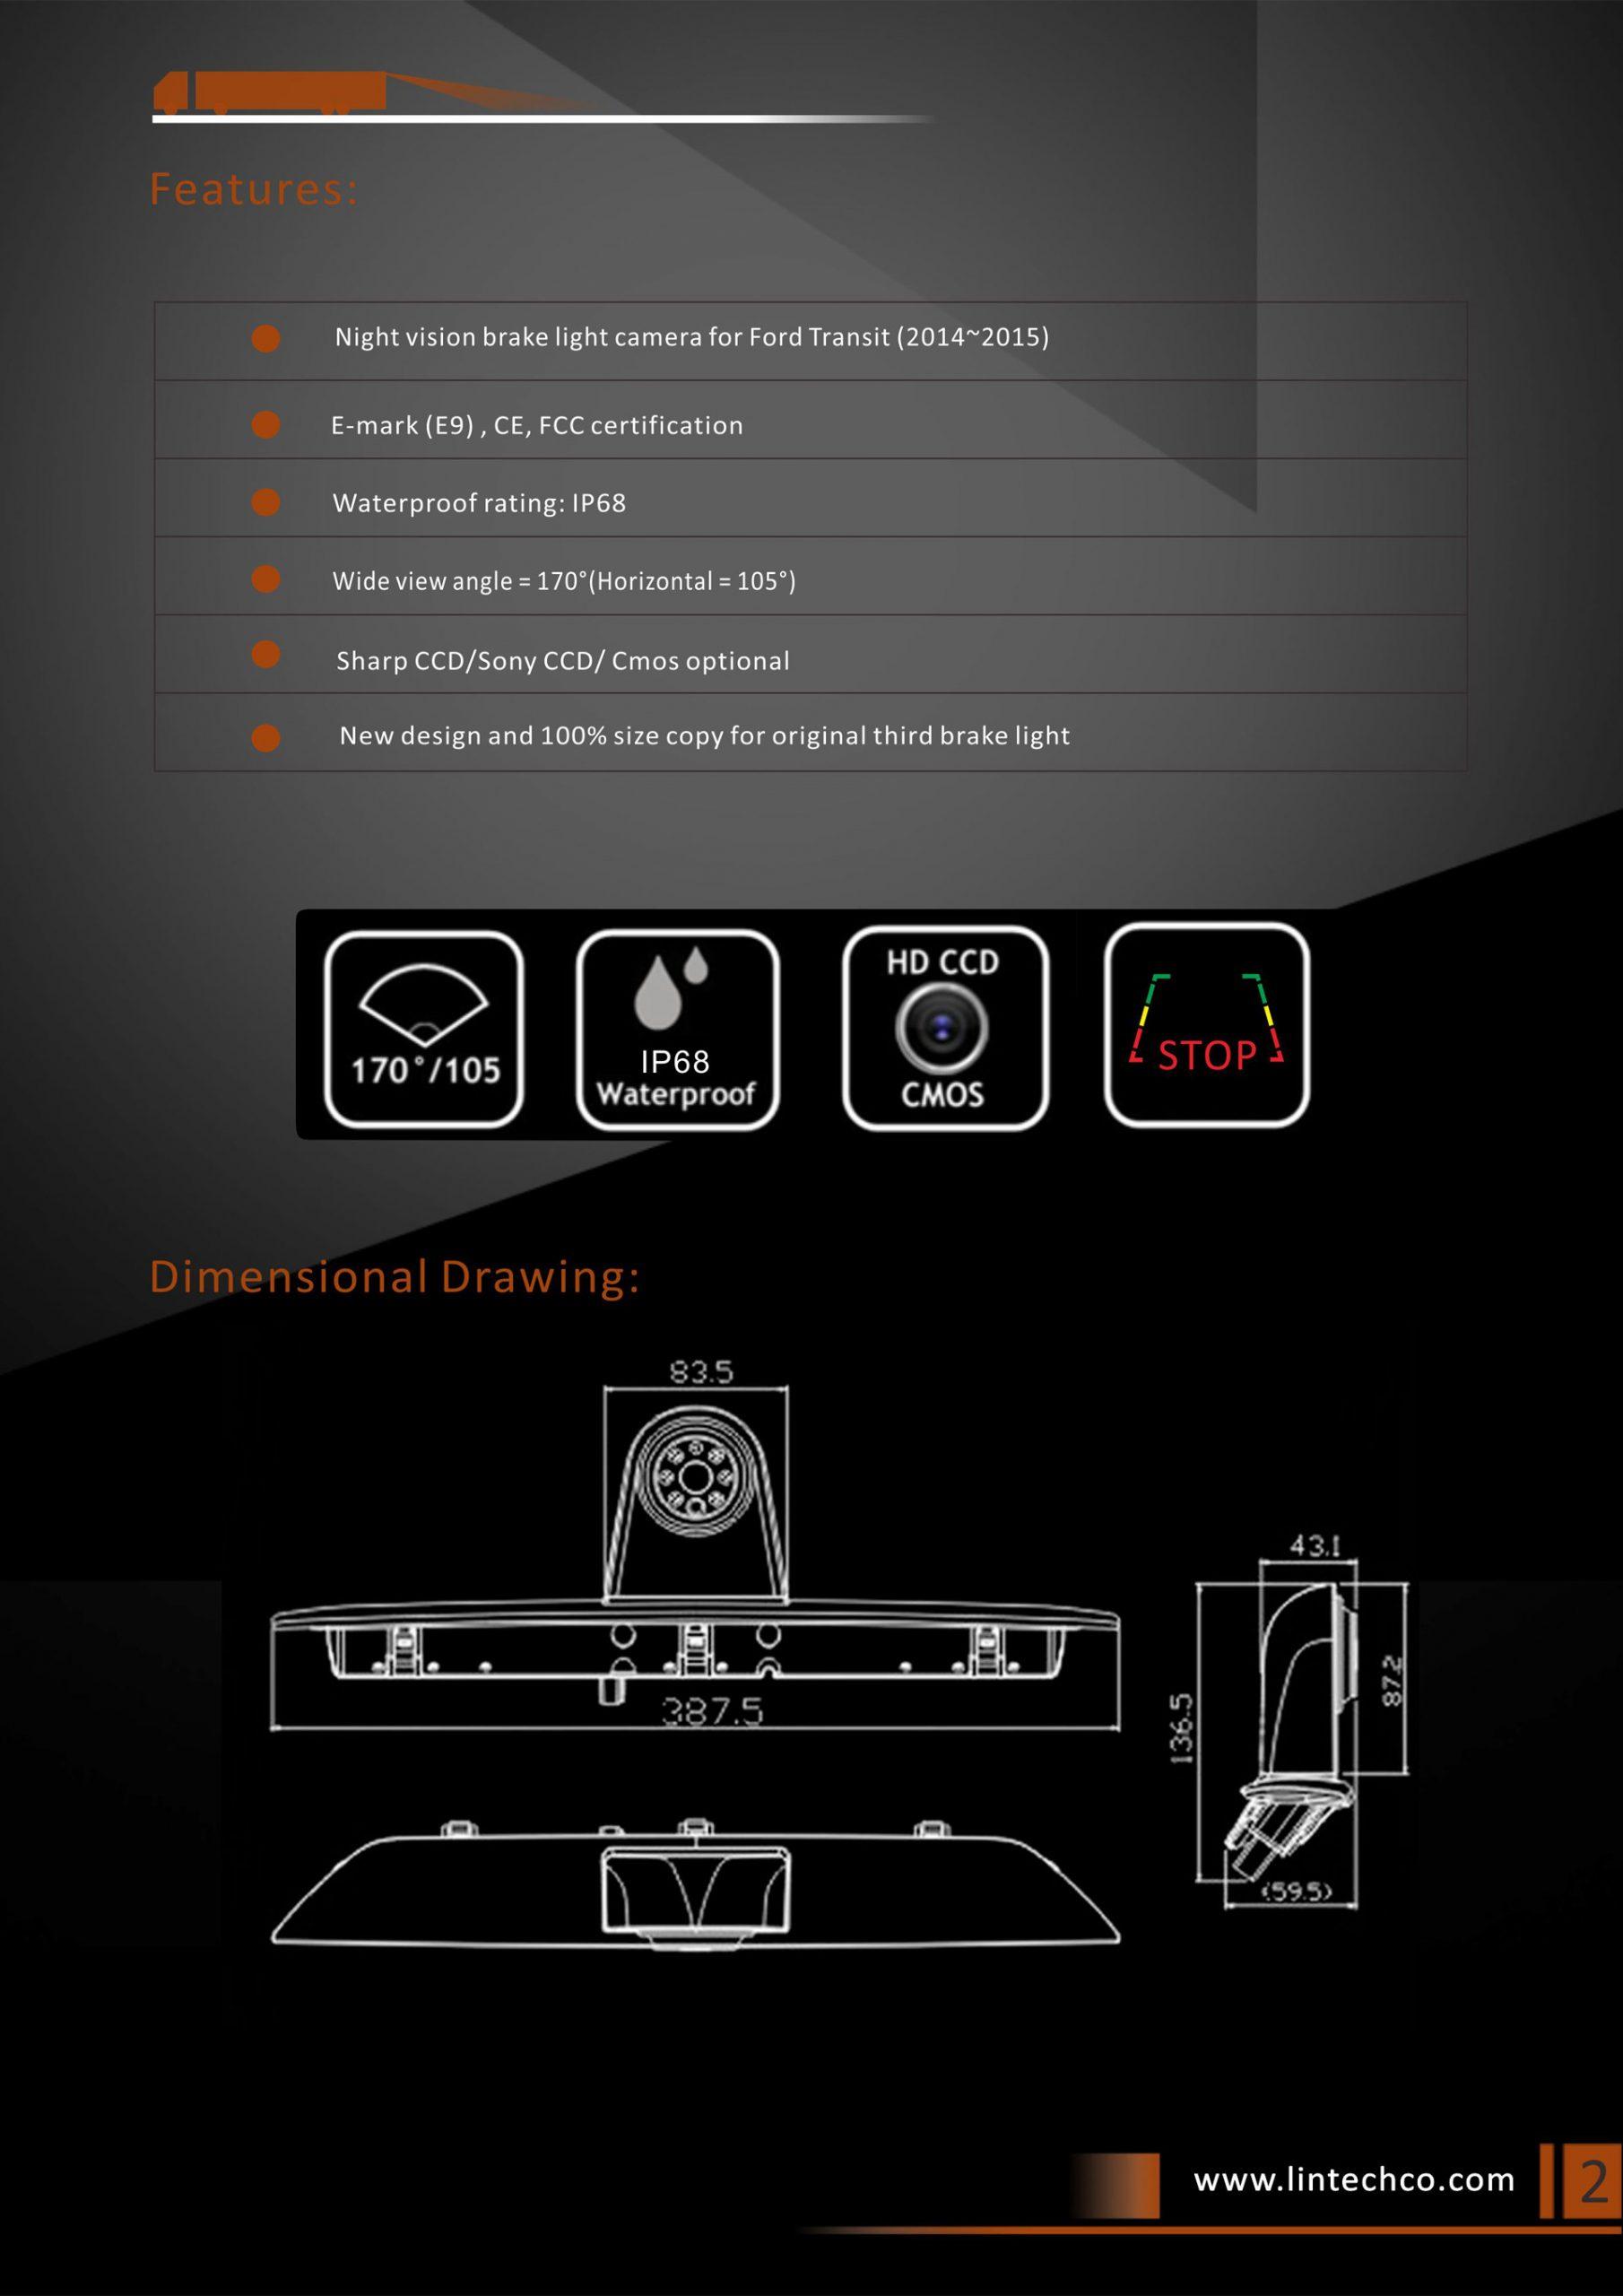 2. Night Vision Brake Light Camera for Ford Transit